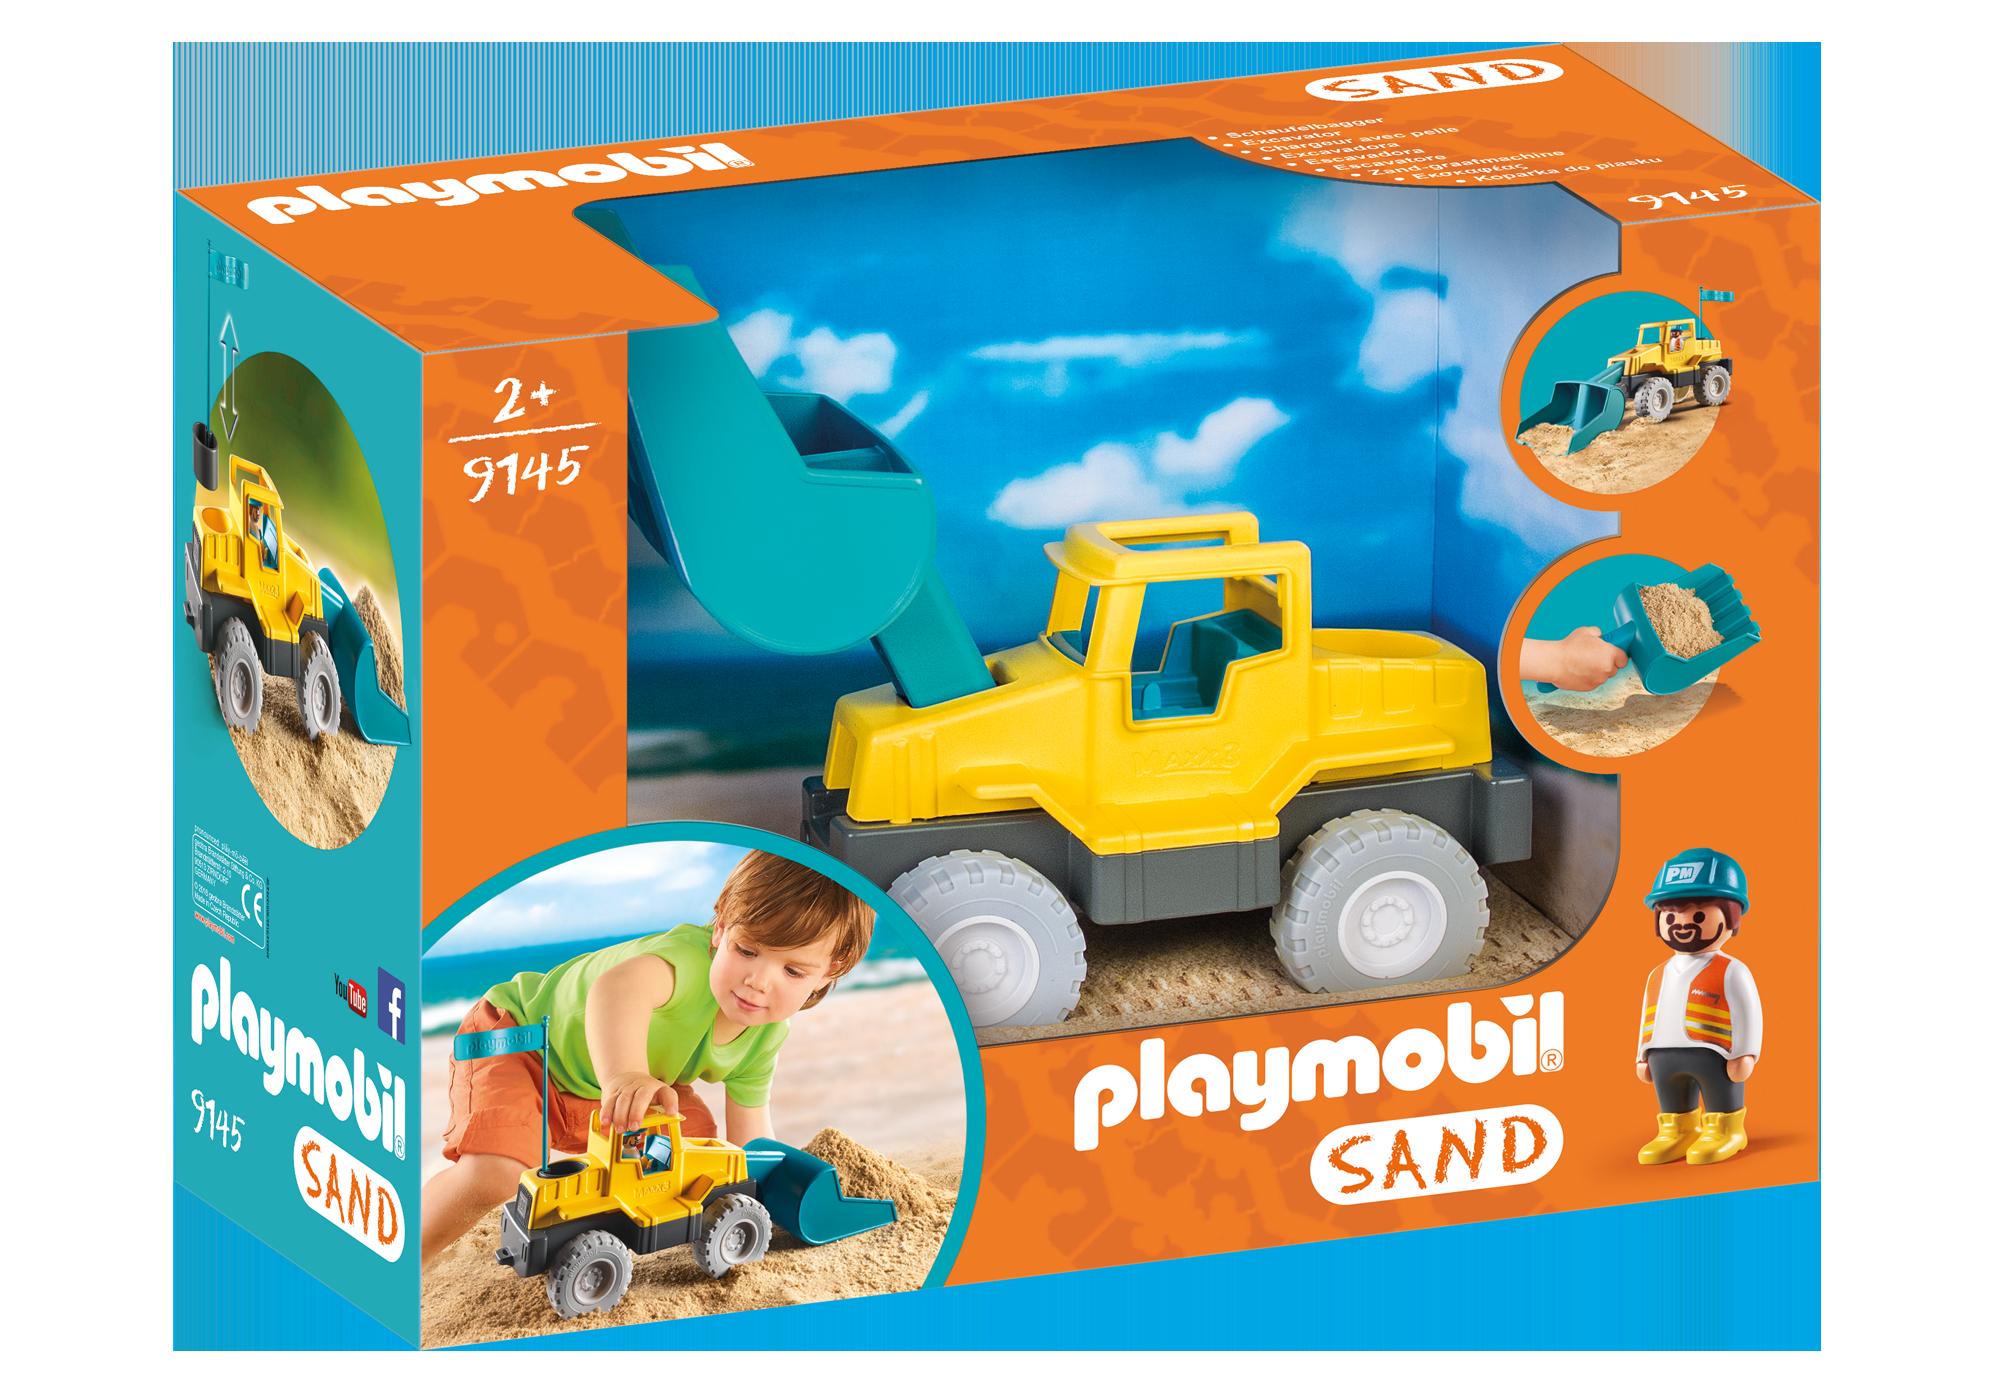 http://media.playmobil.com/i/playmobil/9145_product_box_front